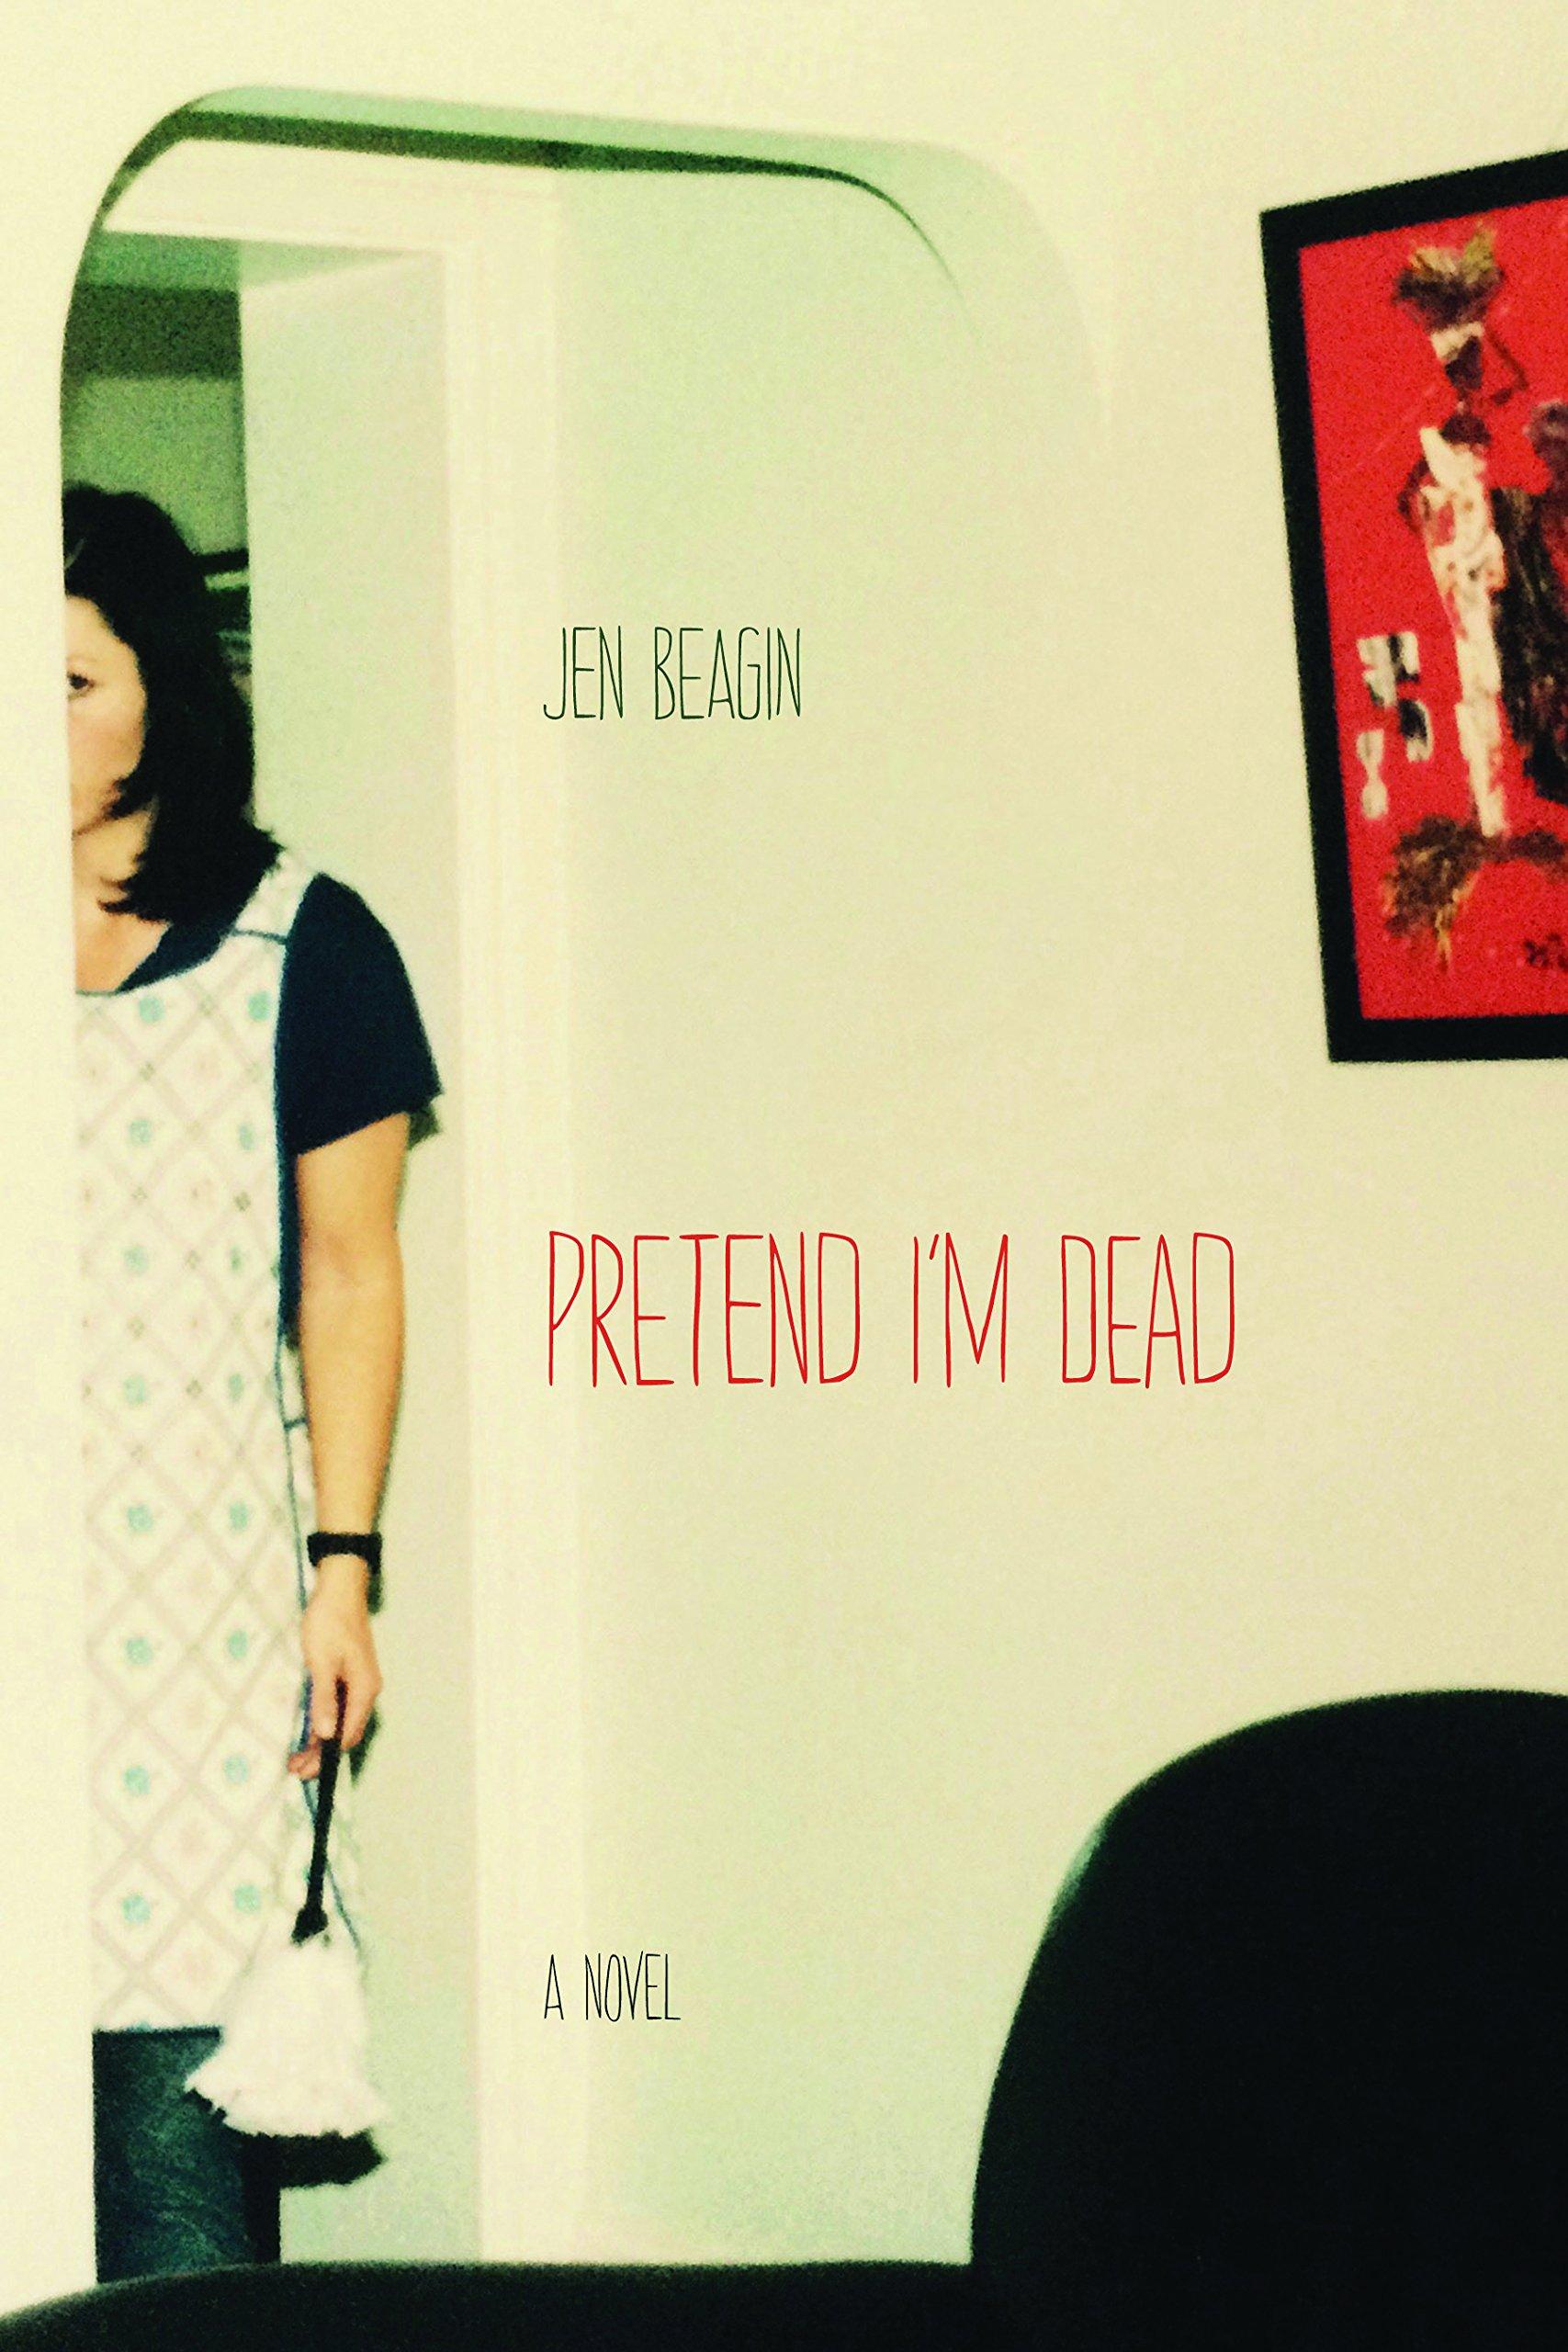 Pretend I'm Dead: A Novel: Amazon: Jen Beagin: 9780810132078: Books